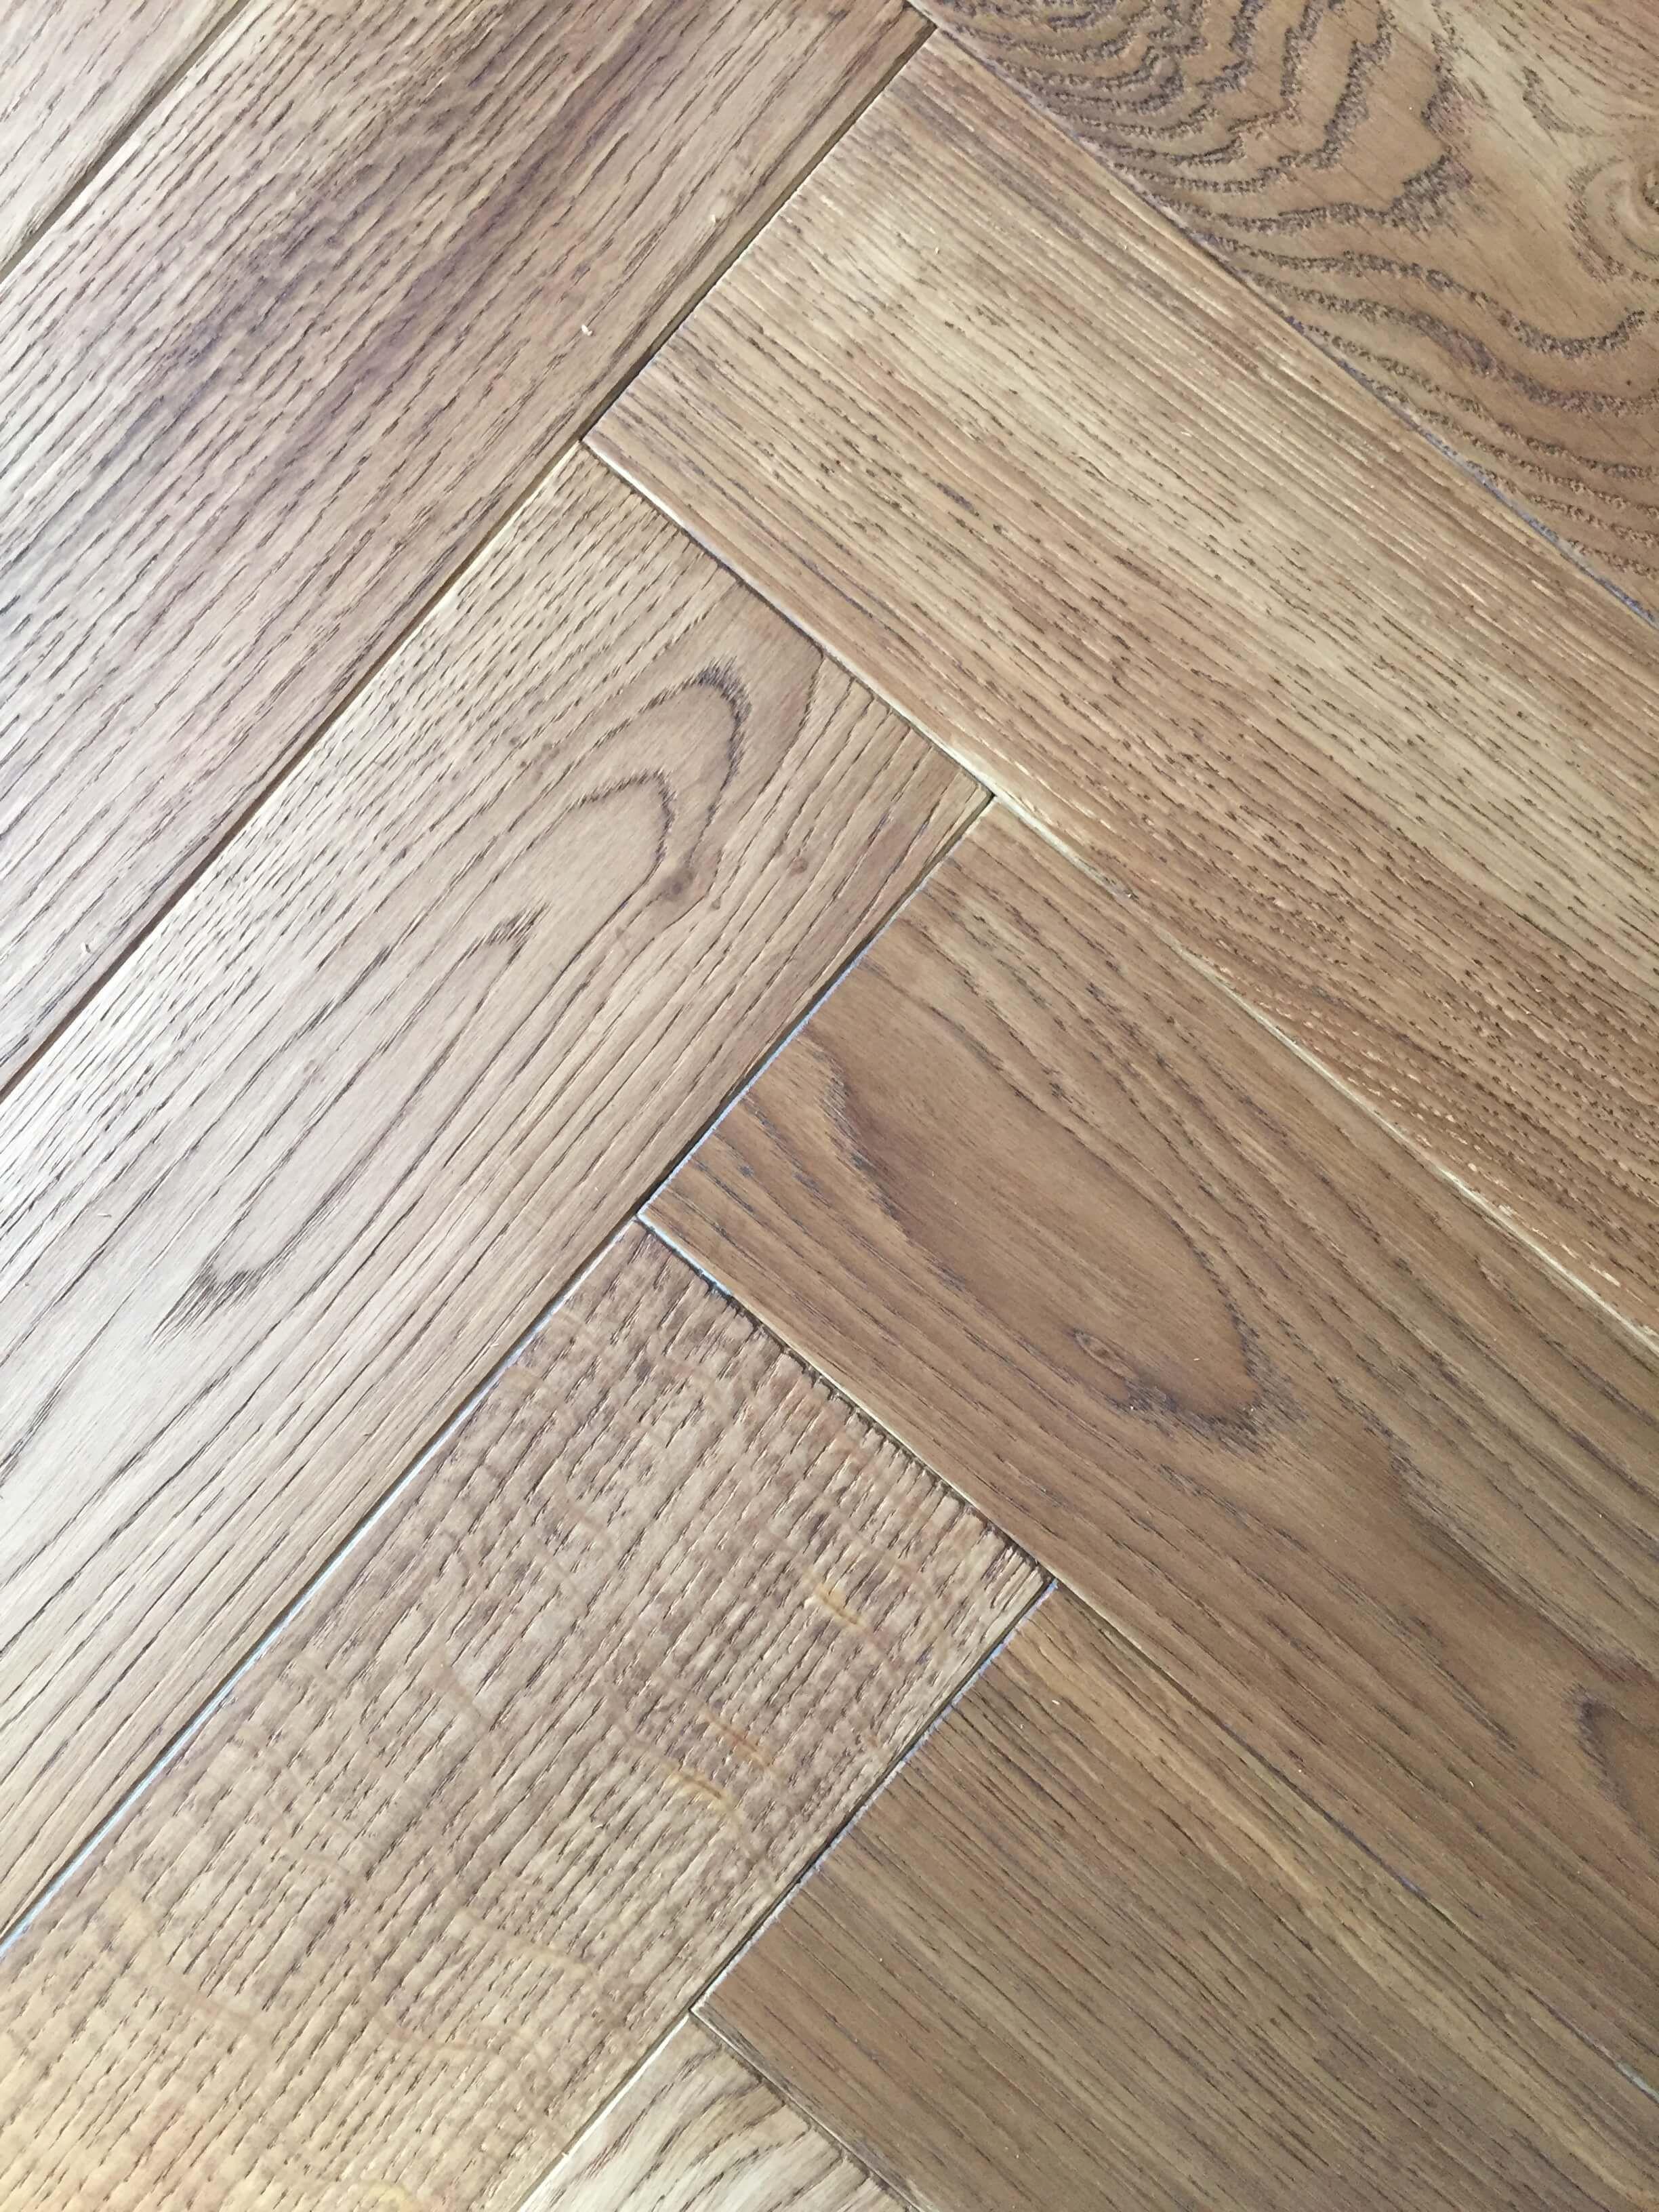 can you mix hardwood floor colors of laminate hardwood flooring stanley park kraus laminate flooring pertaining to 40 light oak engineered hardwood flooring ideas